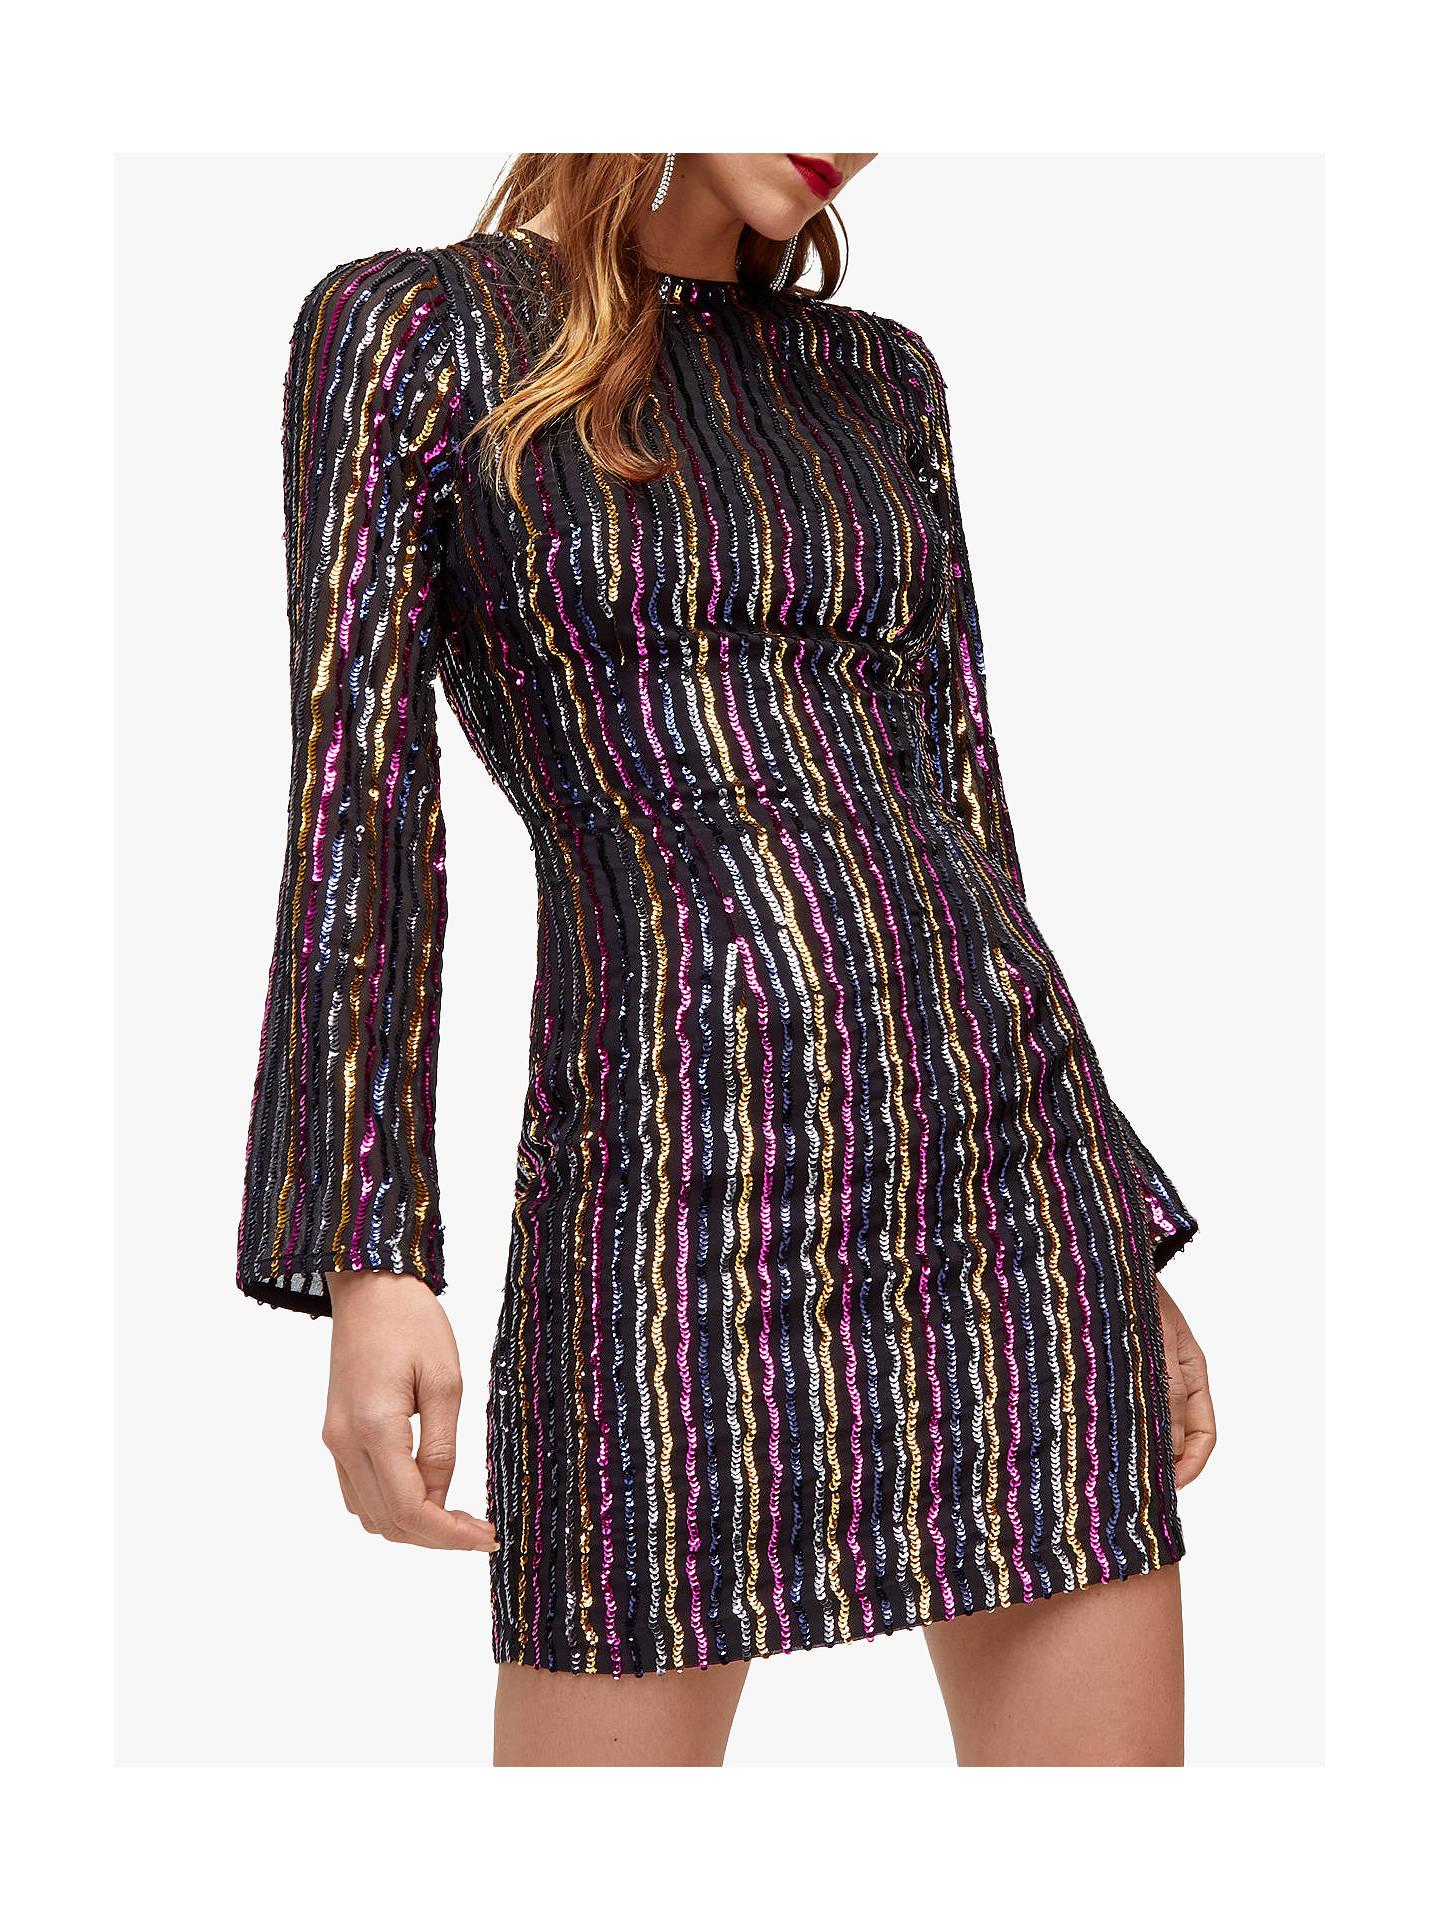 759905613b22d Warehouse Stripe Sequin Dress, Multi at John Lewis & Partners